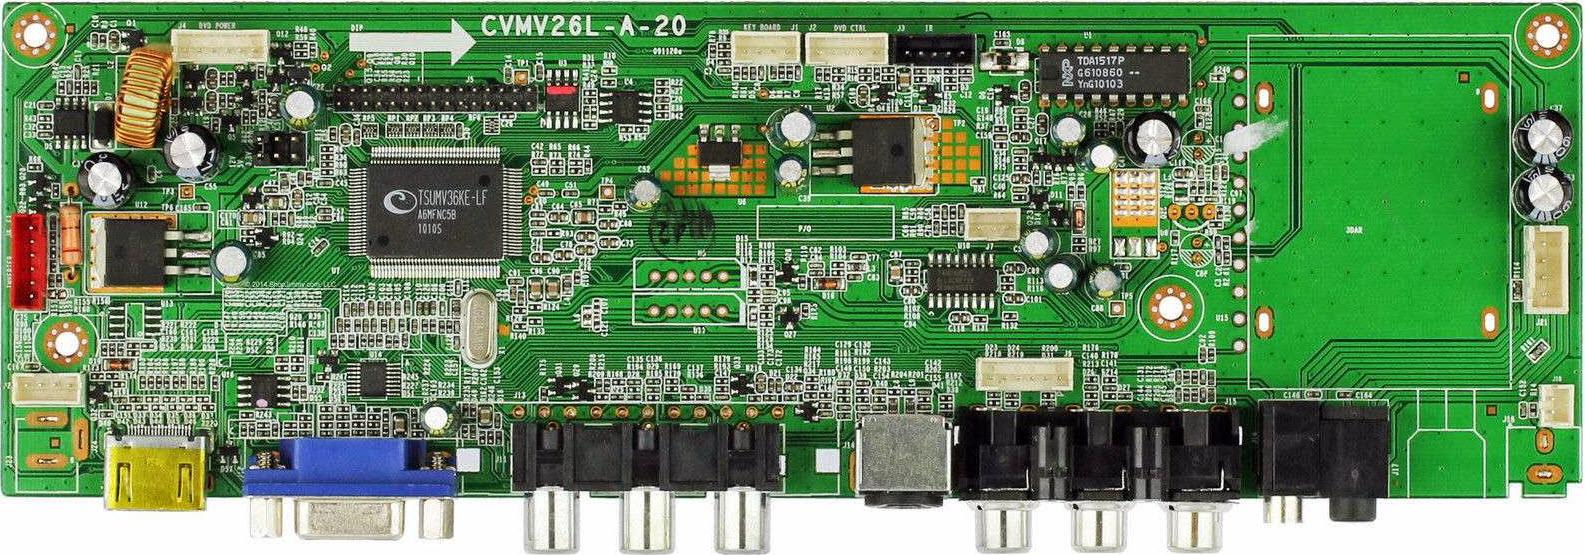 Supra stv-lc1515w схема